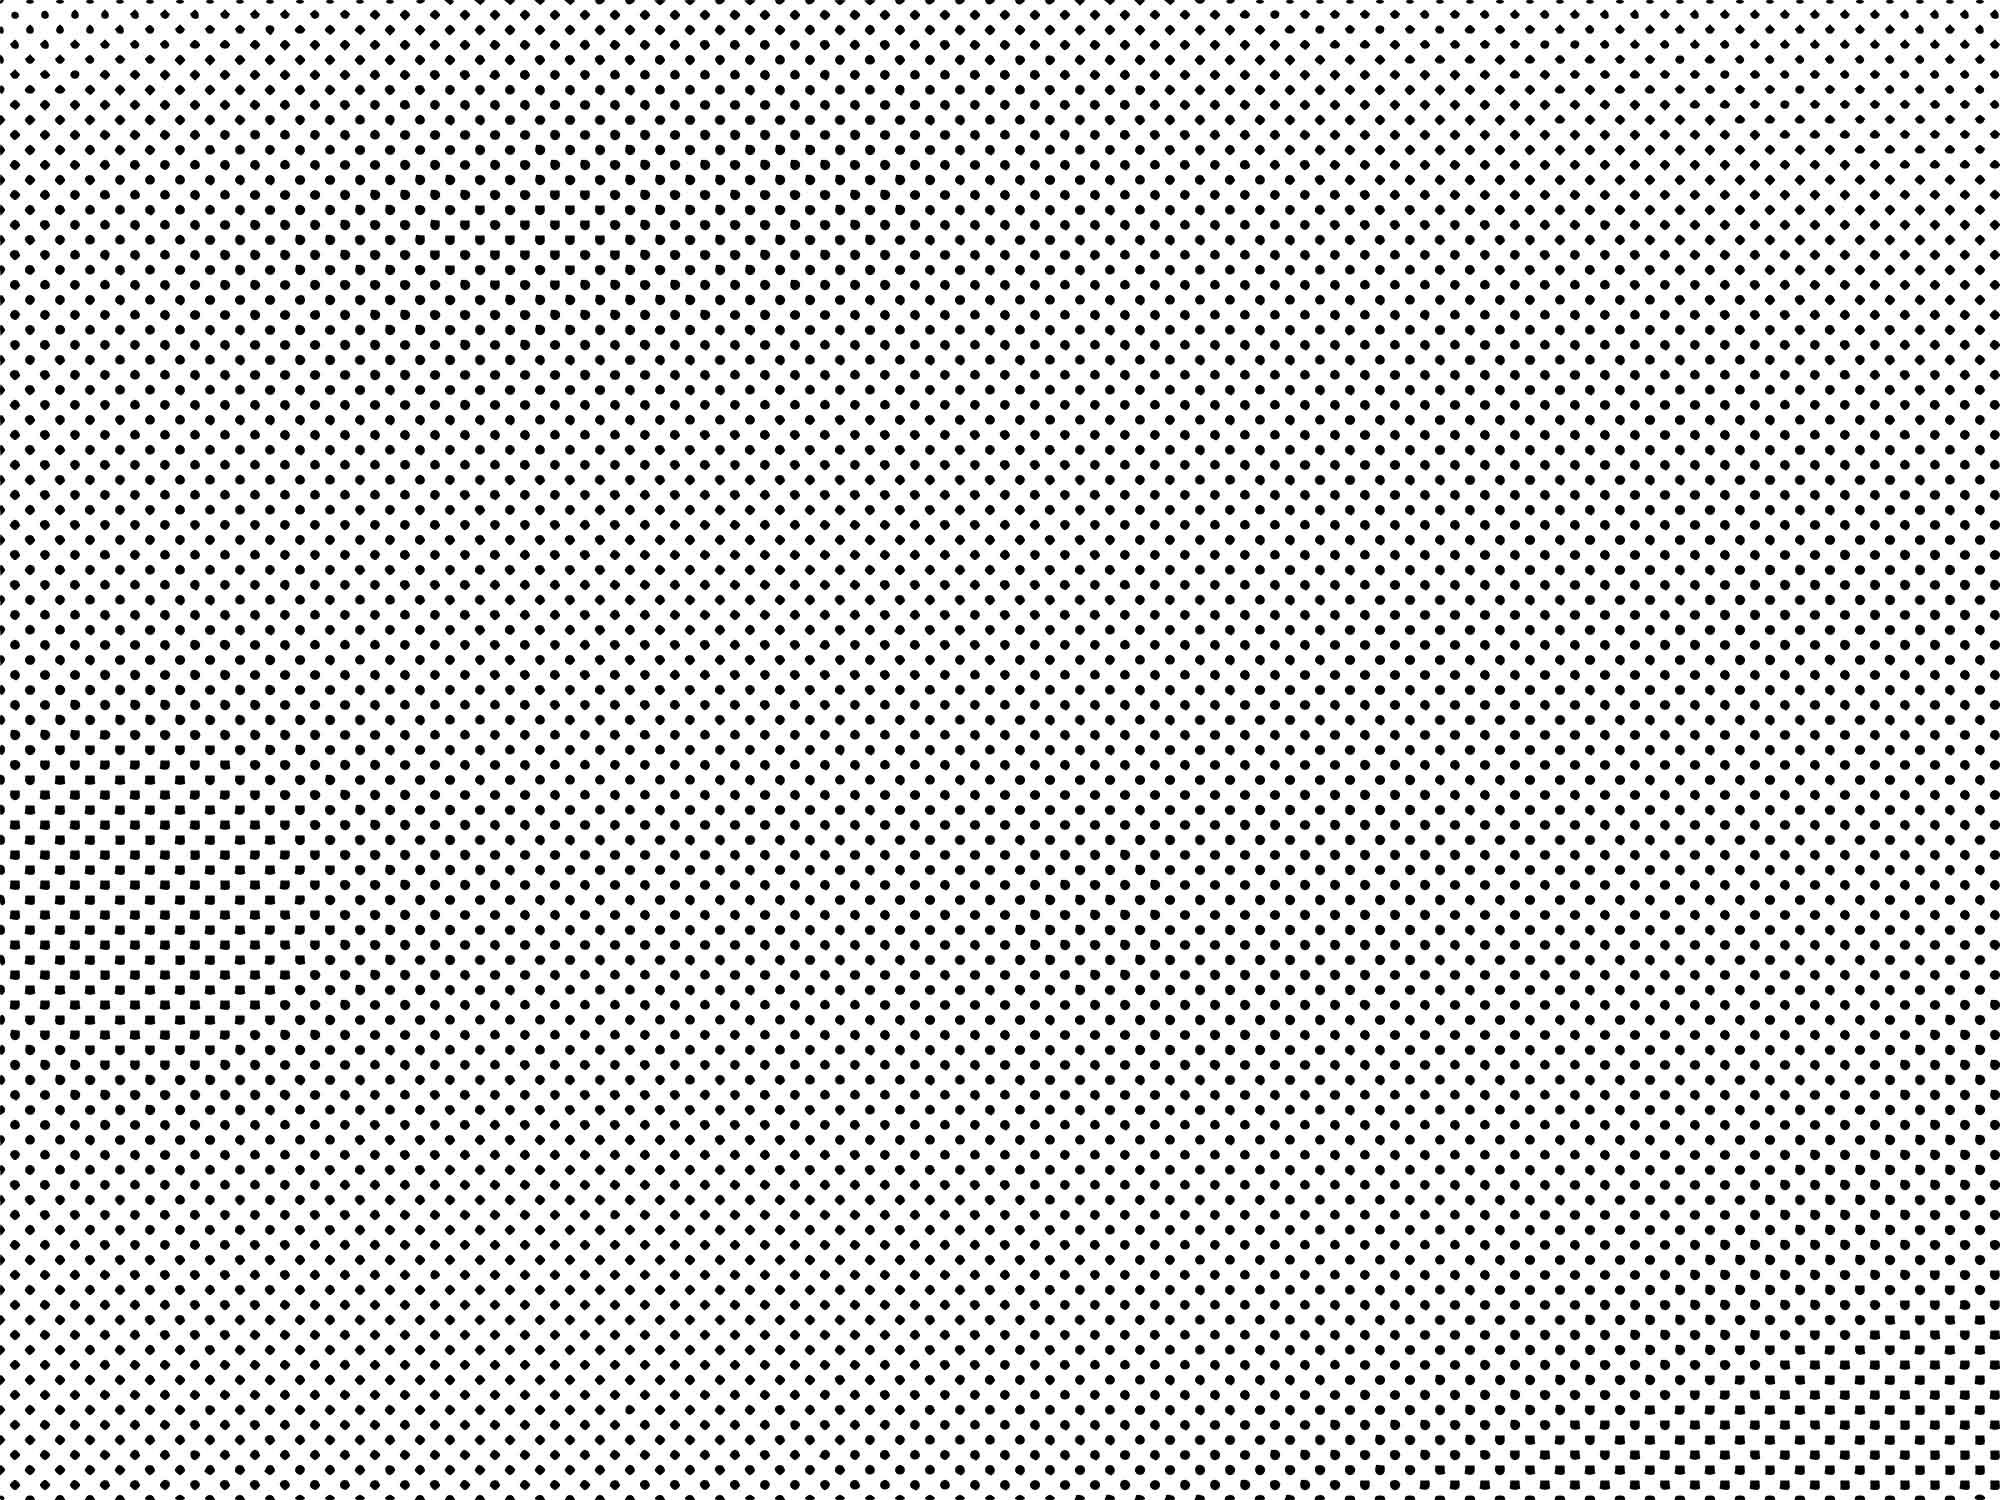 Halftone Dot Textures 8